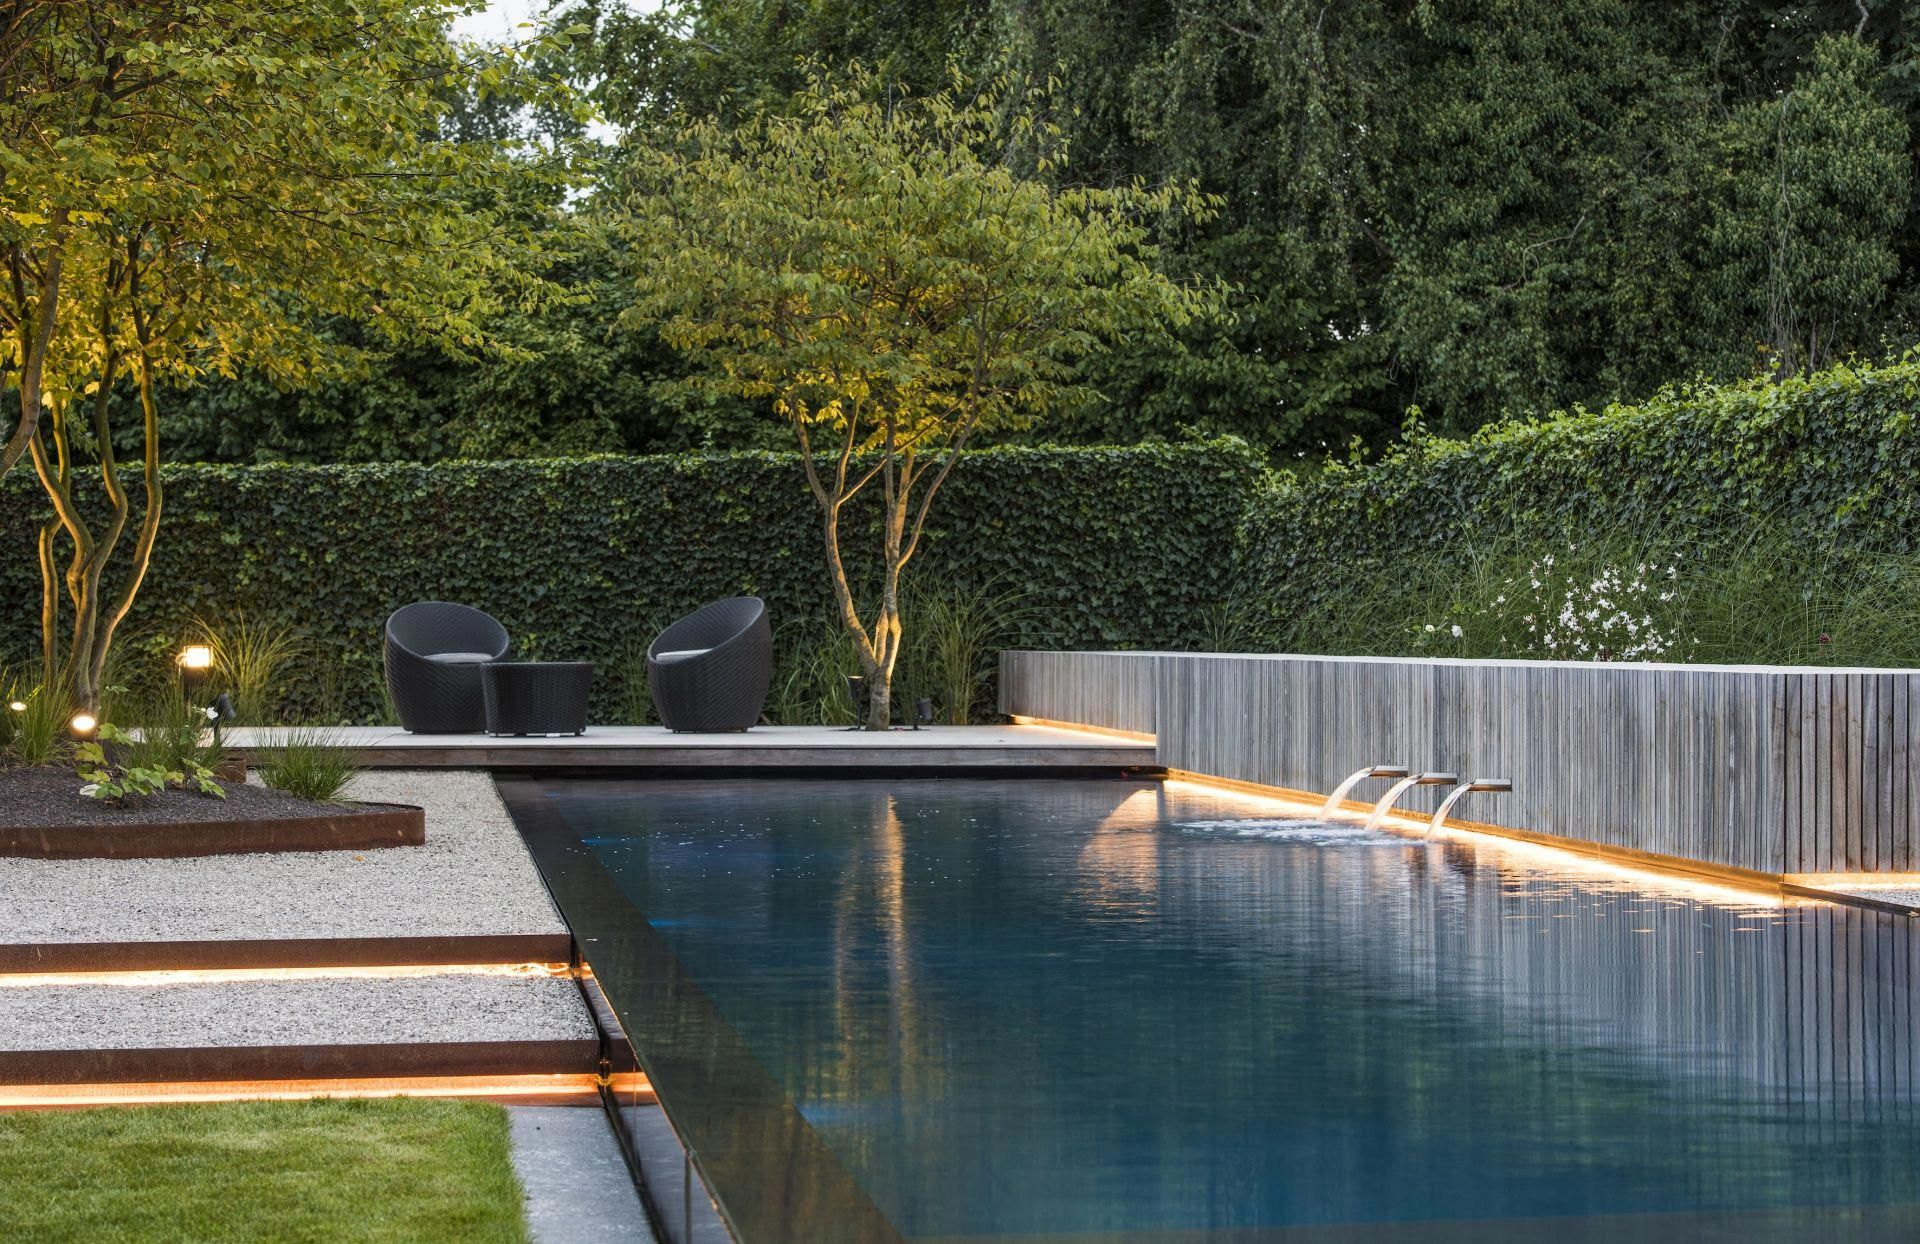 Garden Design Ideas Pinterest Gardendesignideas Pool